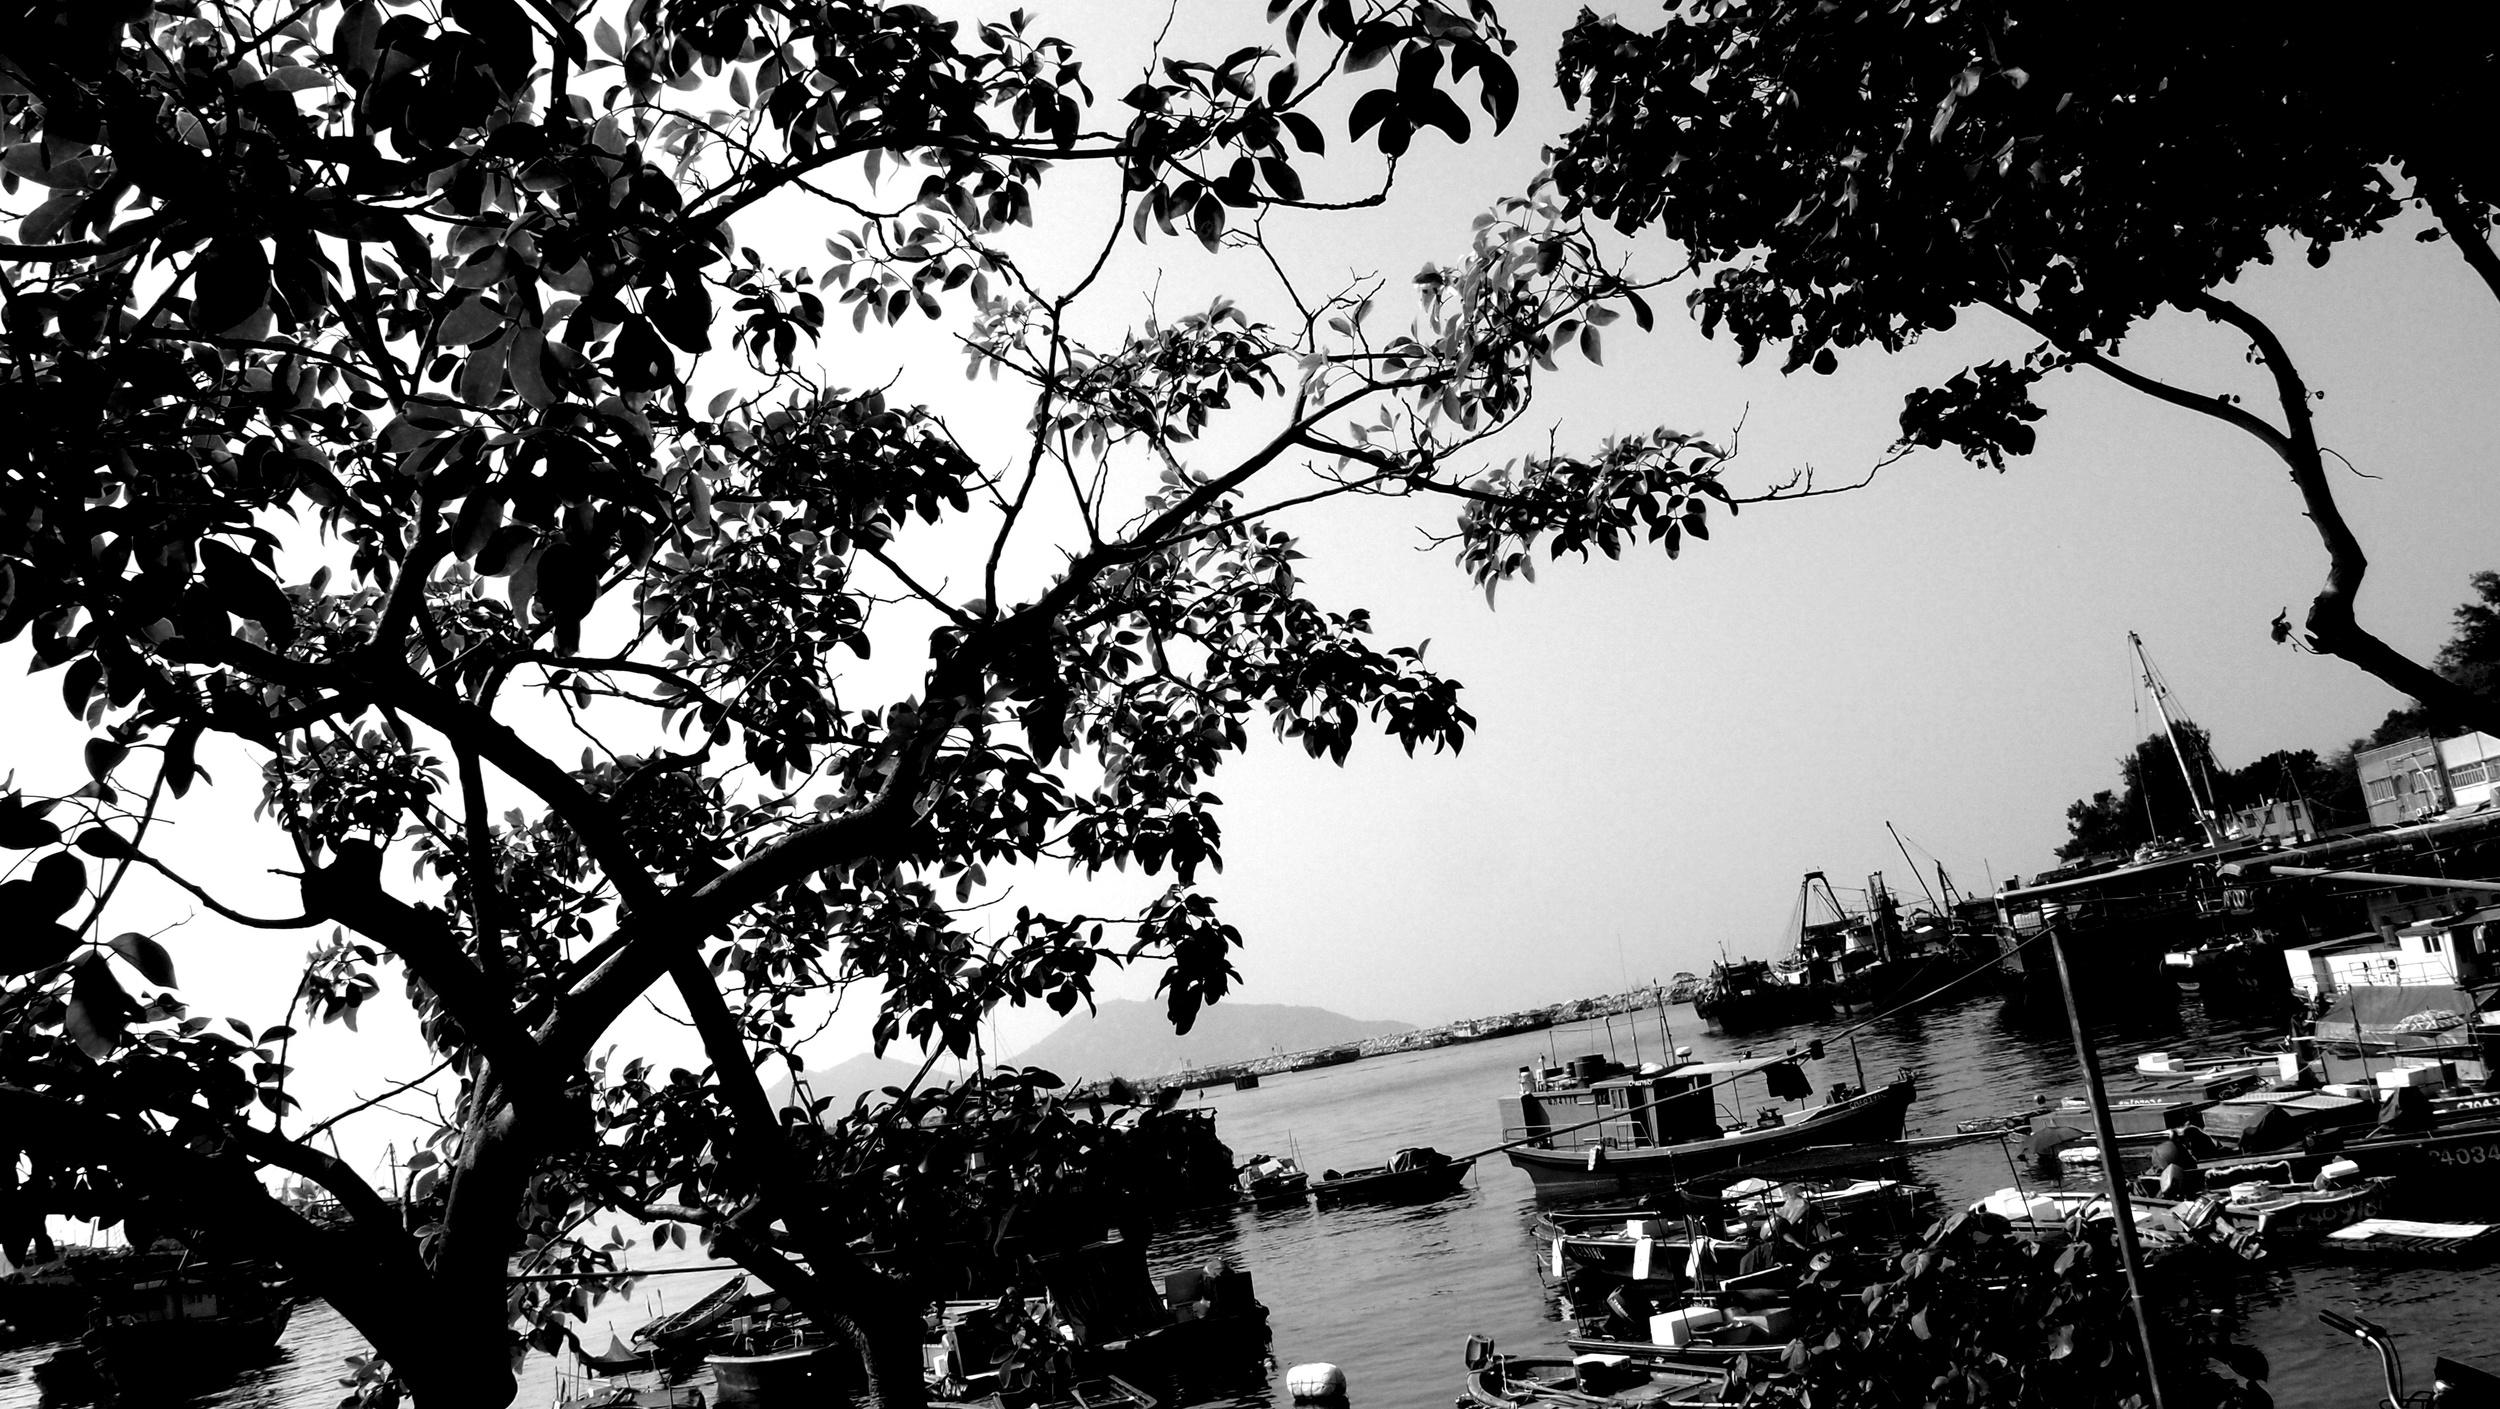 Cheung Chau Island in black & white